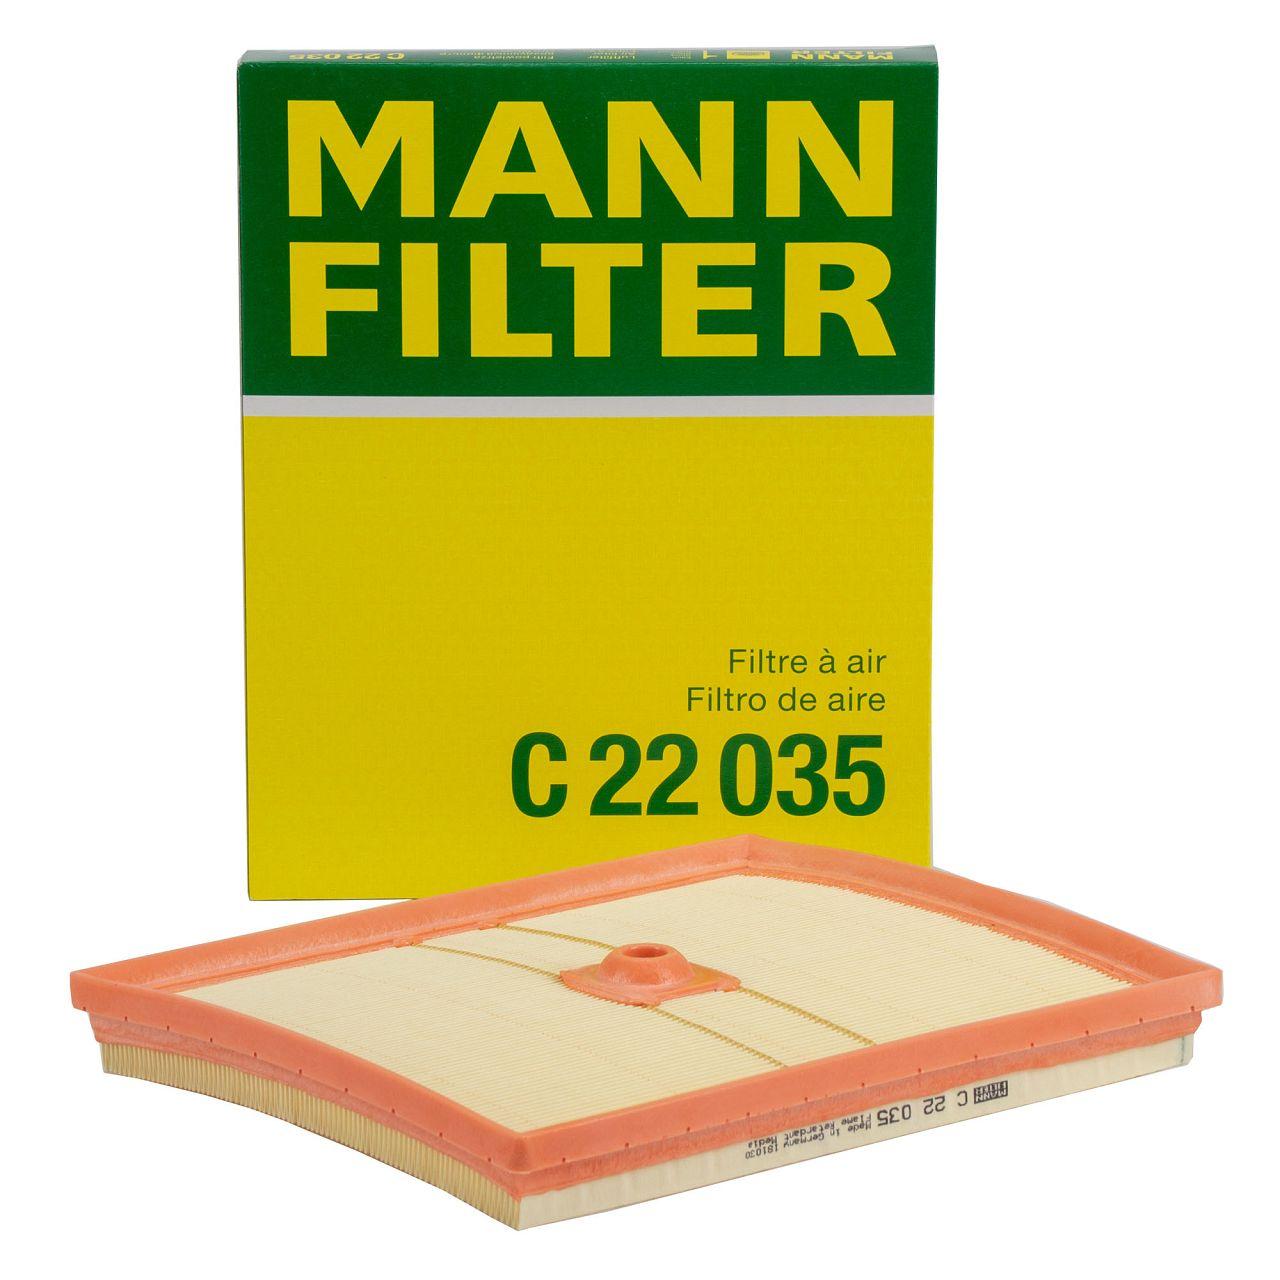 MANN C22035 Luftfilter AUDI A1 8X A3 8V Q2 SEAT SKODA VW Golf 7 Polo Up 1.0 TSI